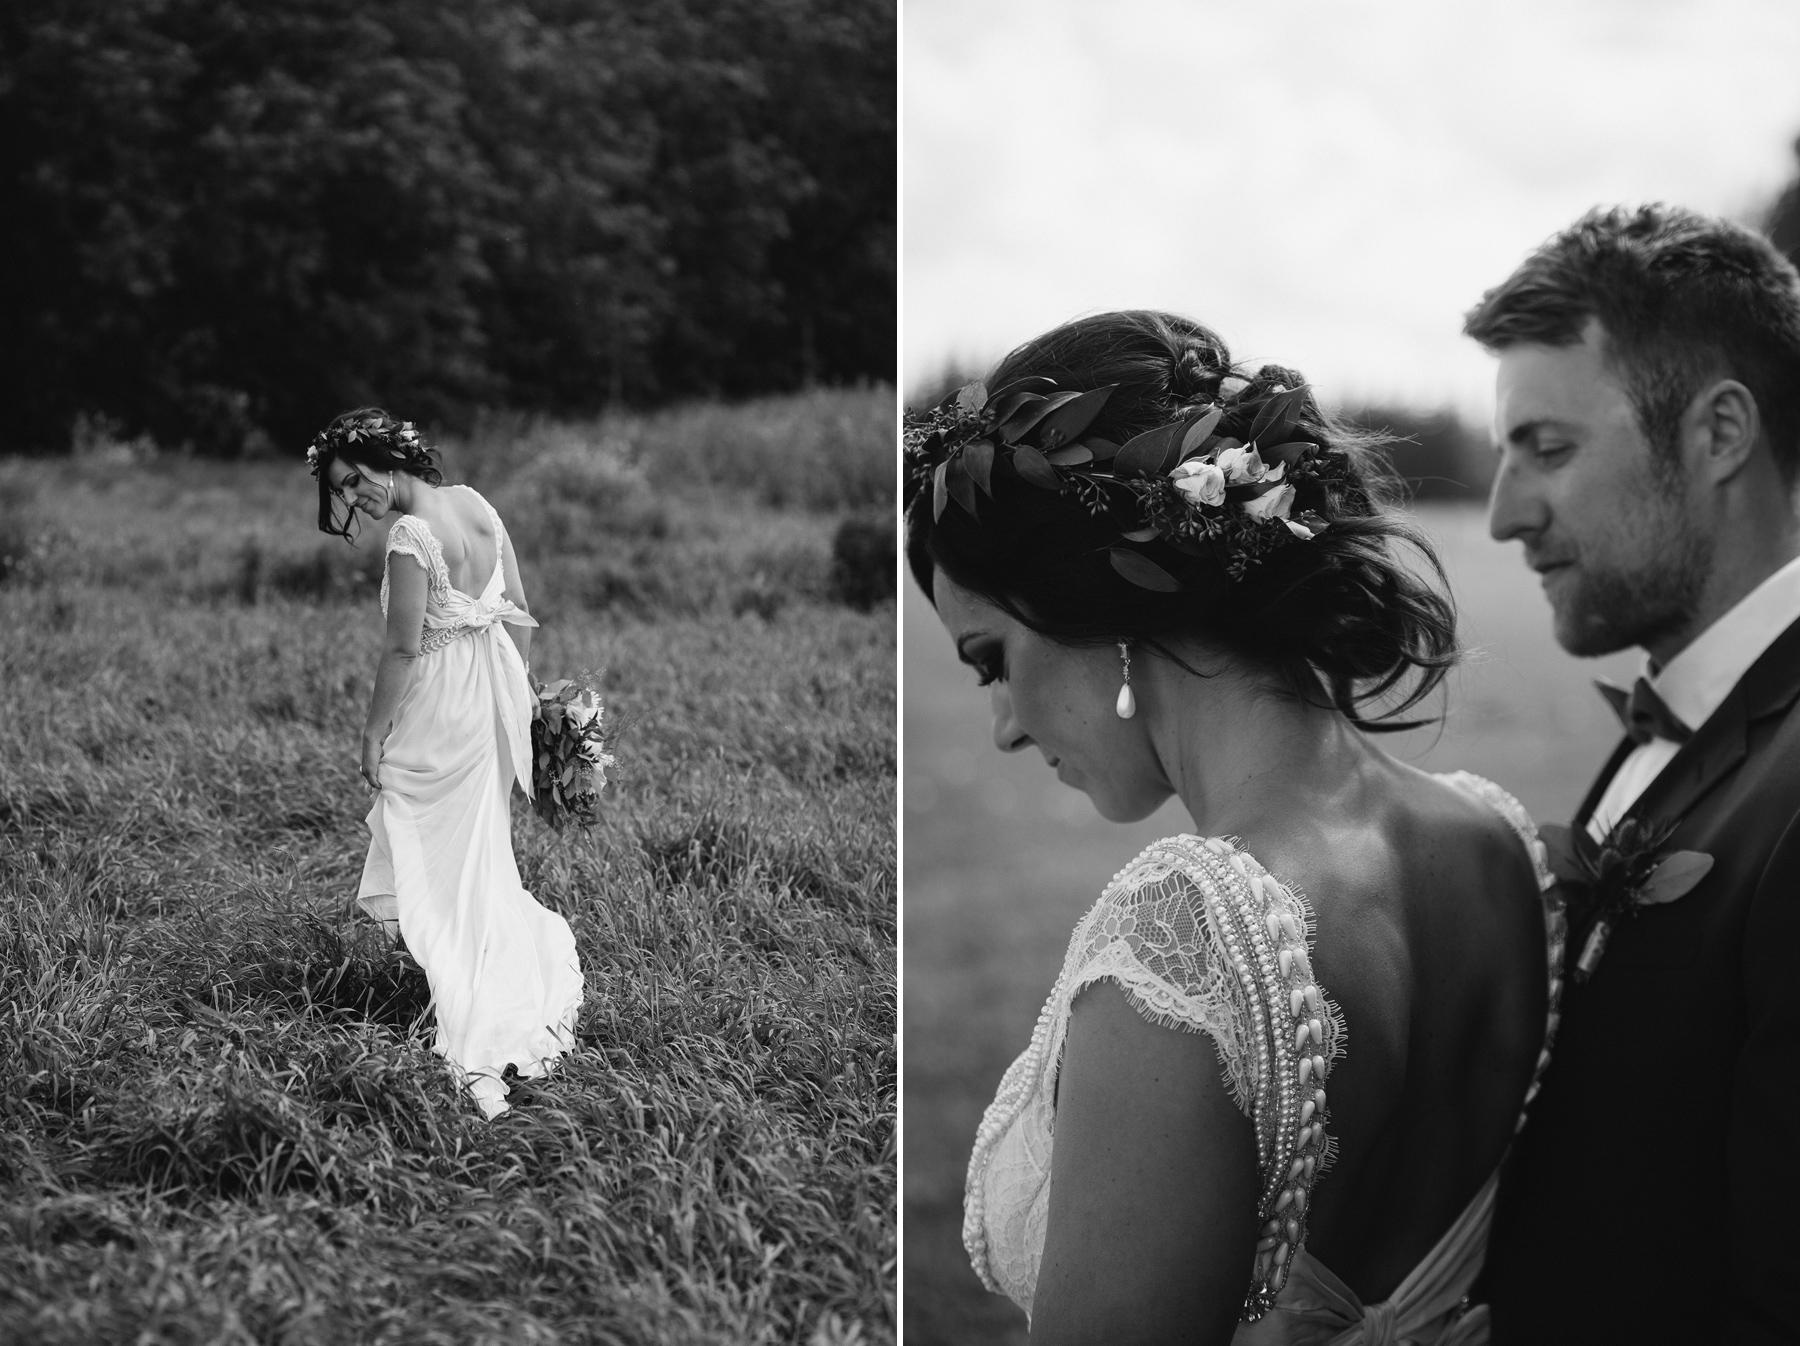 alberta-farm-wedding-photographer-rp-wj-077.jpg